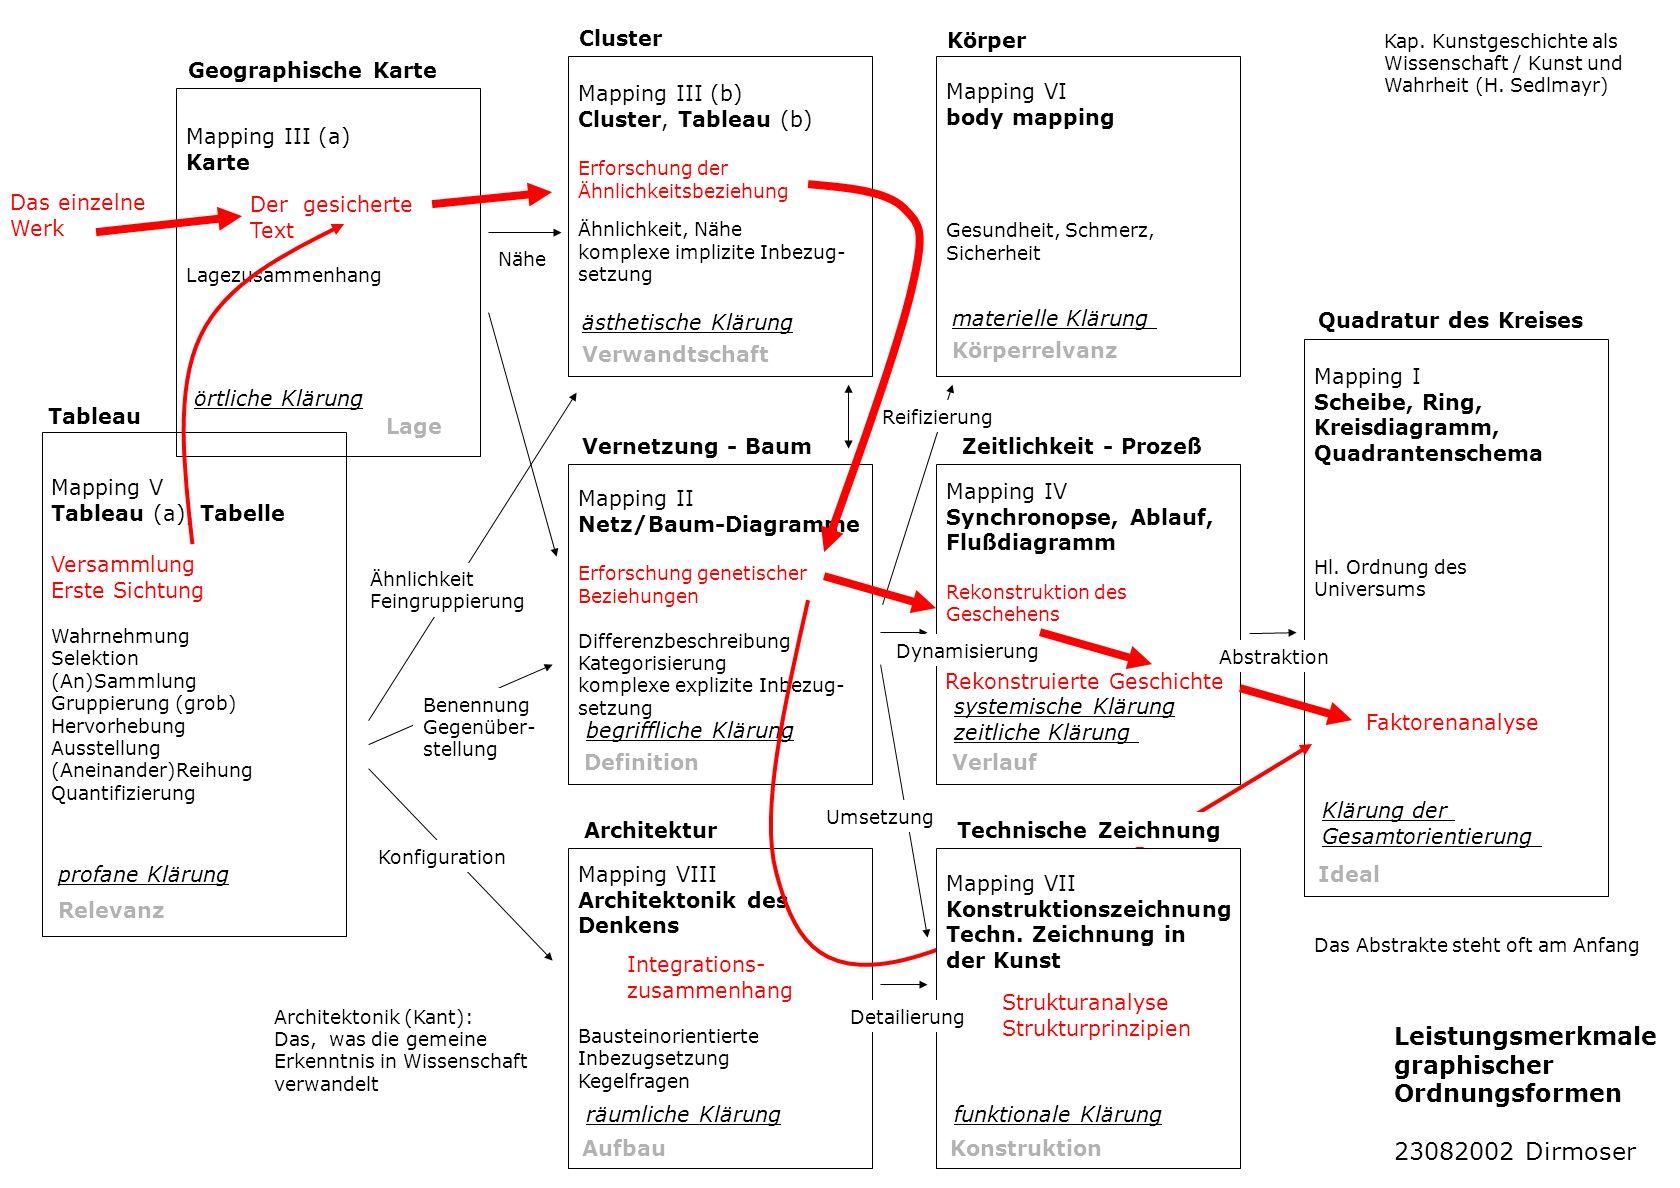 Ähnlichkeit Nähe Identität Ansammlung Abfolge DifferenzProzeß KreisLauf Schichtung - FaltungAufbau Konstruktion Explizitheit der Ordnung Grad der Ordnung Karten Diagramme Pläne Peter Eisenman diagram diaries (F) formal tools (C) conceptual tools (F) disassembling (C) voiding (C) decomposition 1 (F) extrusion (F) extension (F) twisting (F) distortion (F) torquing (C) striation 1 (F) superposition (F) warping (F) doubling 1 (F) slippage (C) artificial excavation (C) folding (C) montage 1 (C) layering 1 (C) blurring 1 (F) displacement (F) projection (C) mapping 1 (F) shear (C) marking 3 (C) layering 2 (F) shifting (F) repetition (F) scaling (F) morphing (F) imprinting (C) marking 1 (C) inversion 1 (C) blurring 2 (C) inversion 2 (F) interweaving (C) gridding (F) intersection (C) grafting (C) marking 2 (C) decomposition 2 (F) nesting (C) layering 3 (F) doubling 2 (F) interference (F) transformation (C) tracing (C) laminar flow (C) striation 2 (C) mapping 2 (C) montage 2 (C) layering 4 Topologischer Strukturalismus Dirmoser 11.2002 (F) rotation